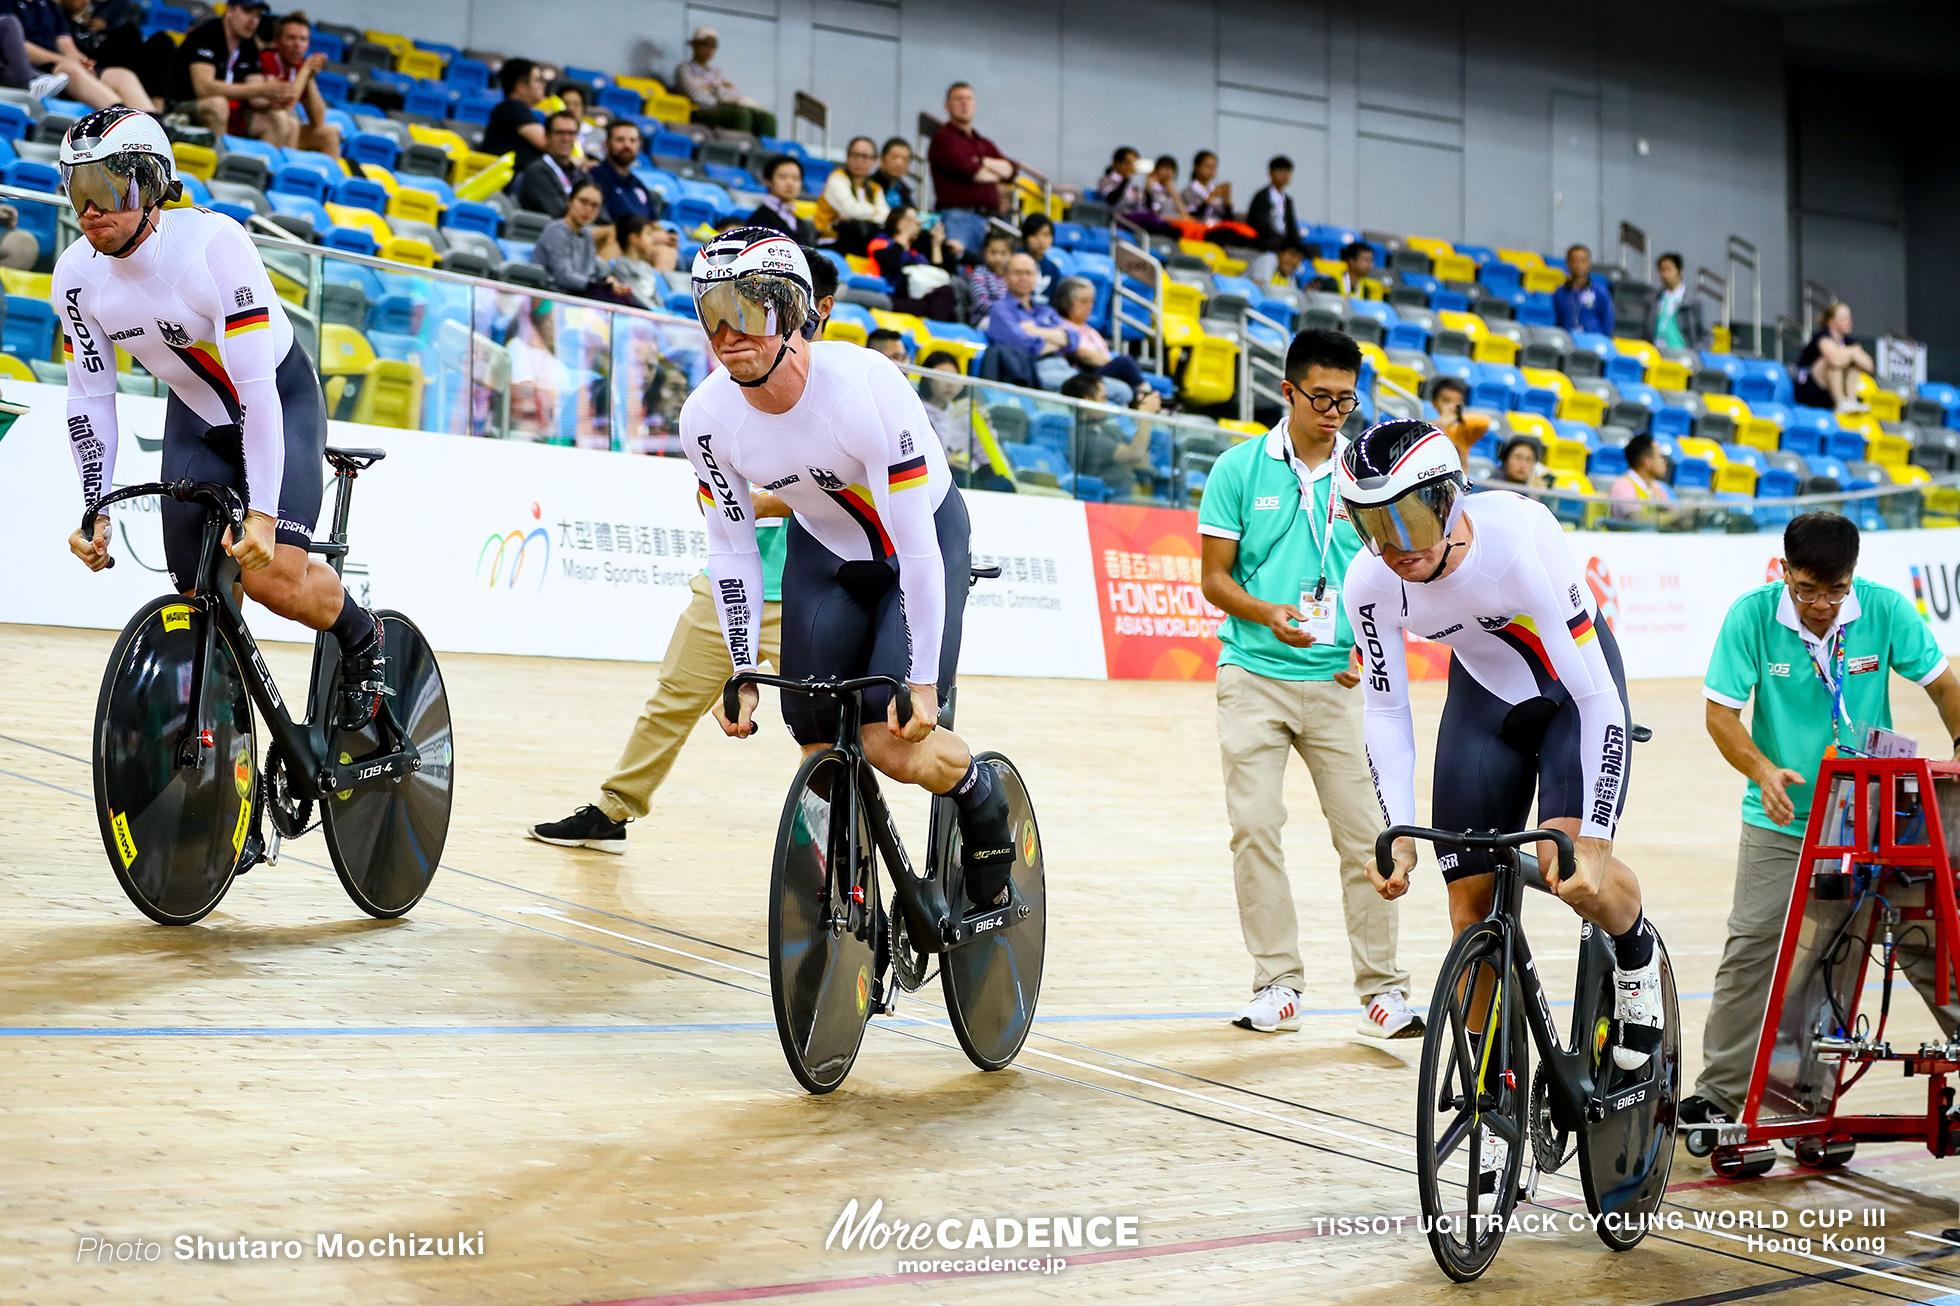 Final / Men's Team Sprint / TISSOT UCI TRACK CYCLING WORLD CUP III, Hong Kong